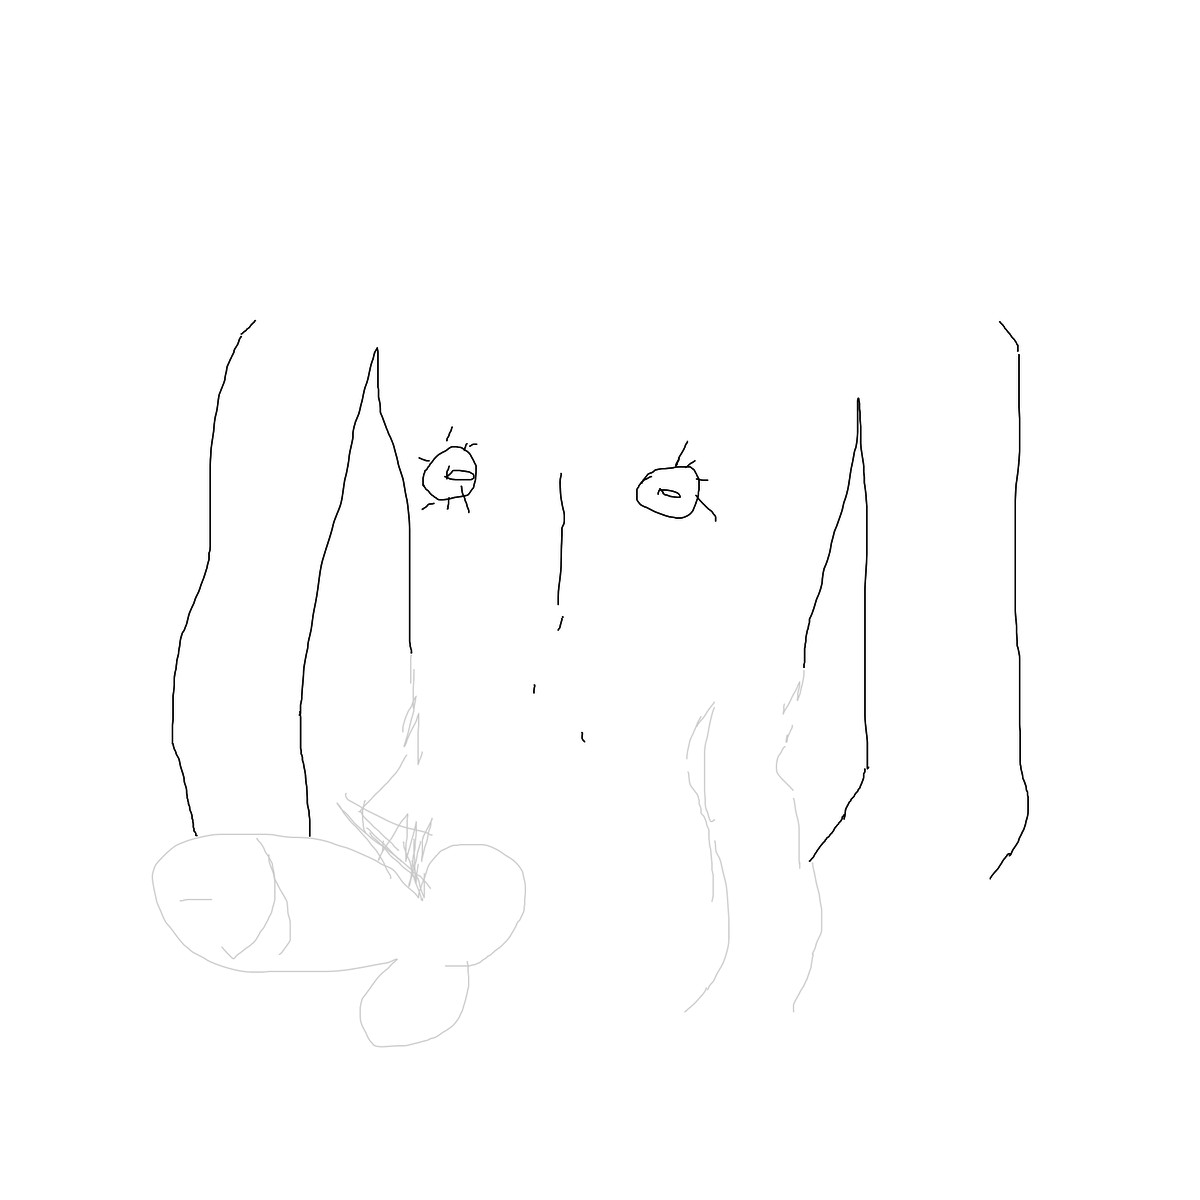 BAAAM drawing#9337 lat:63.4897804260253900lng: 26.3671970367431640